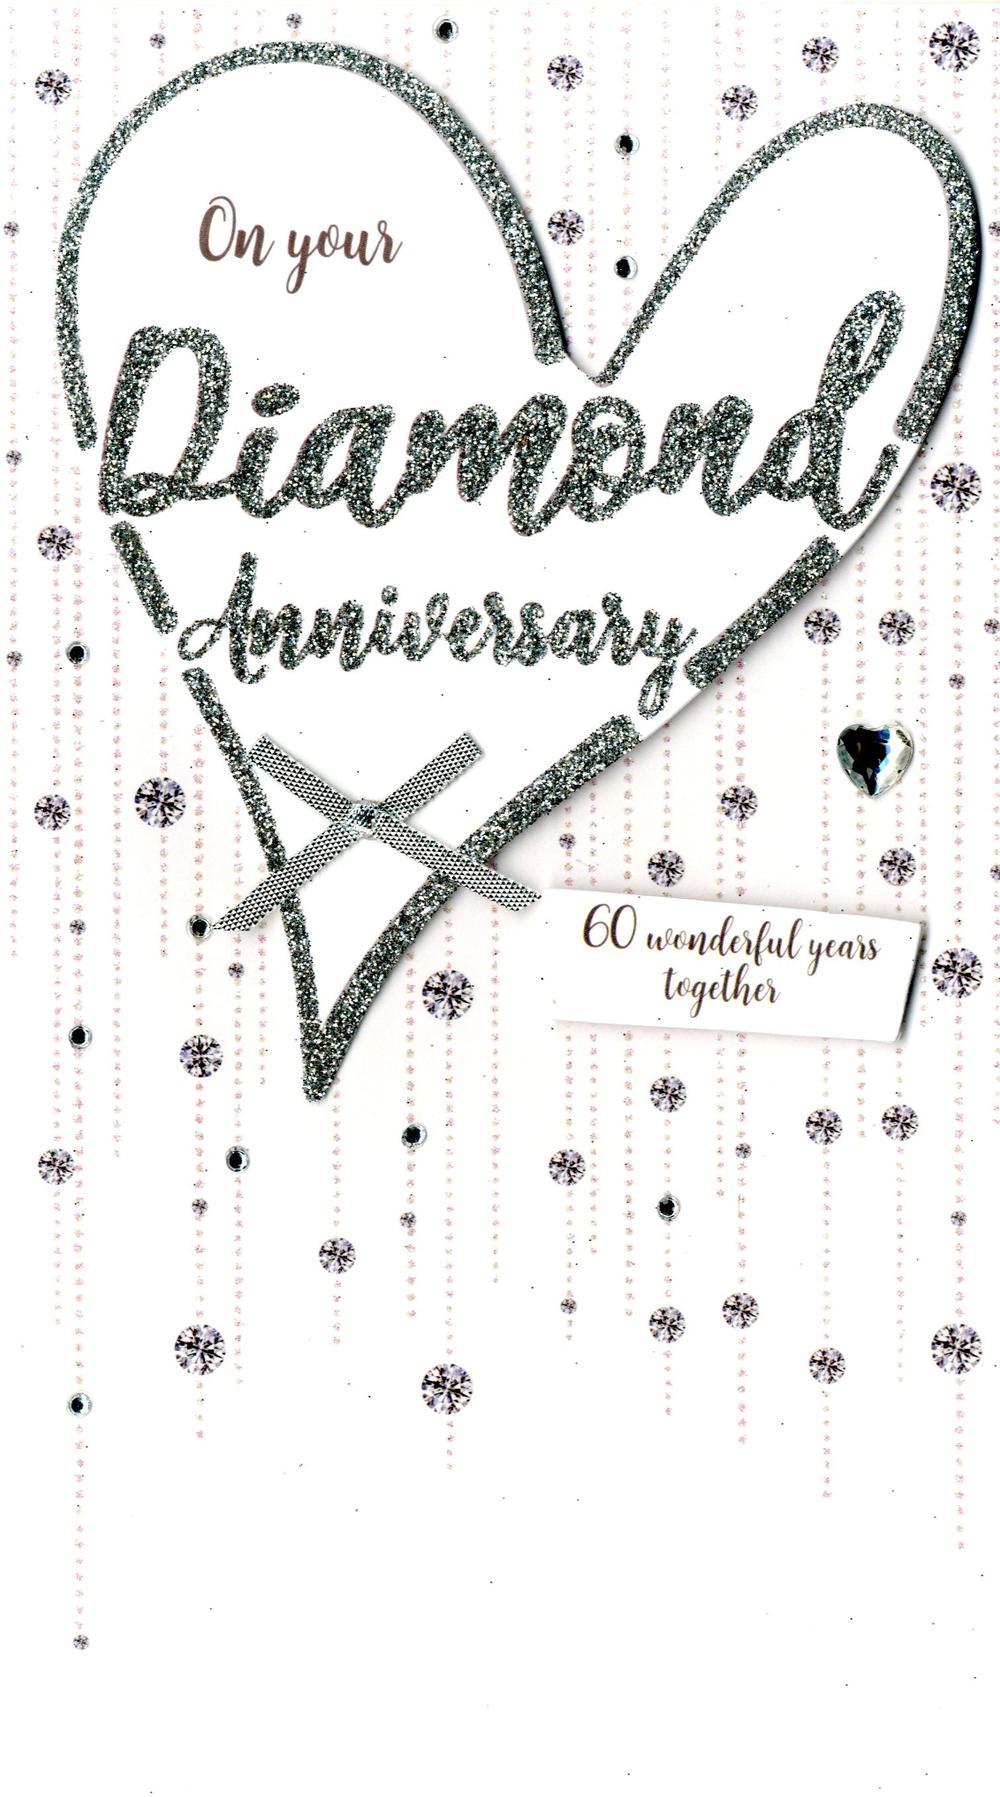 Diamond Anniversary Greeting Card Hand-Finished